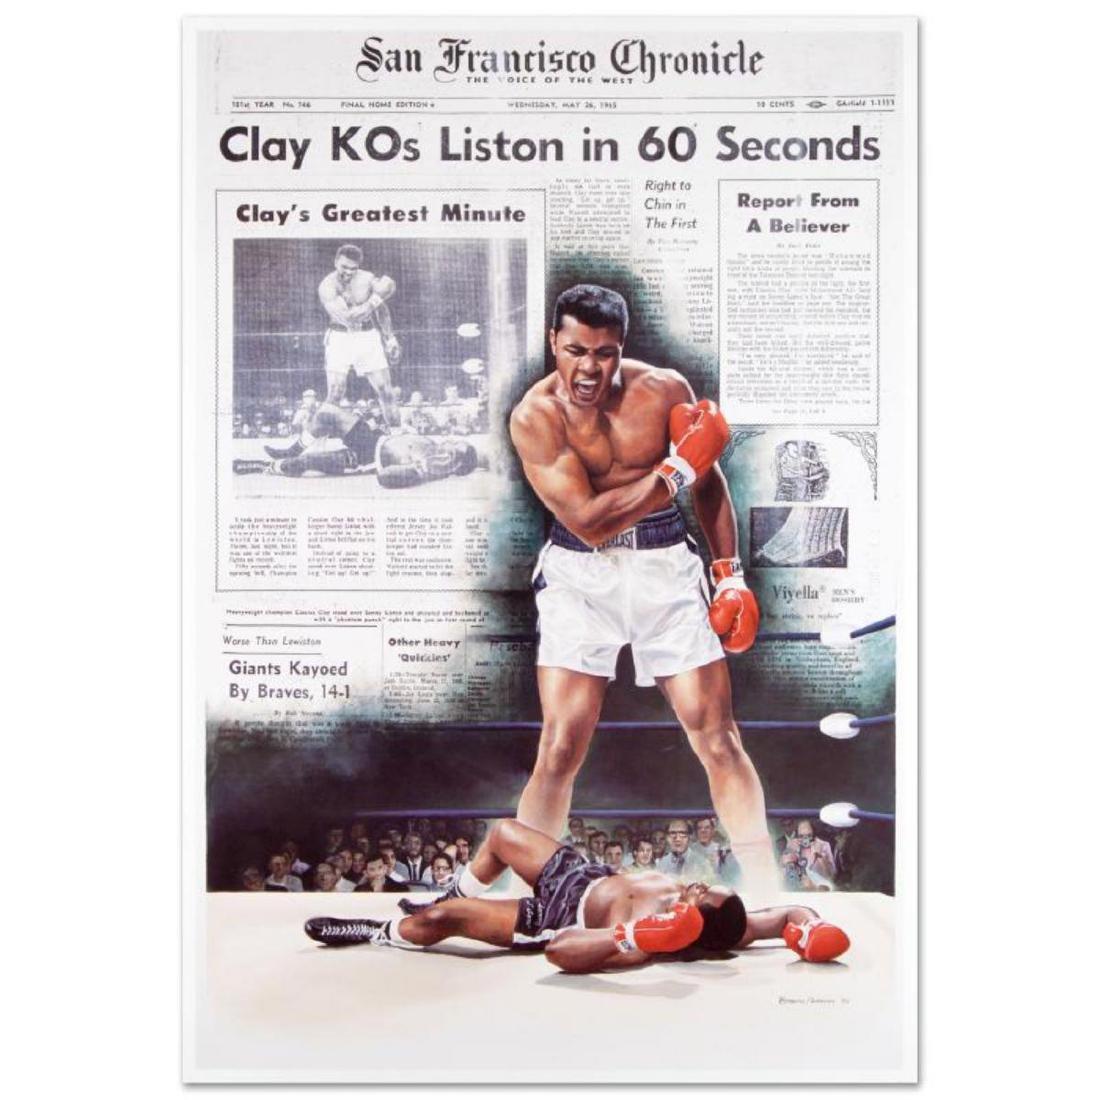 """Clay KOs Liston"" FINE ART POSTER (25.5"" x 37"") of"